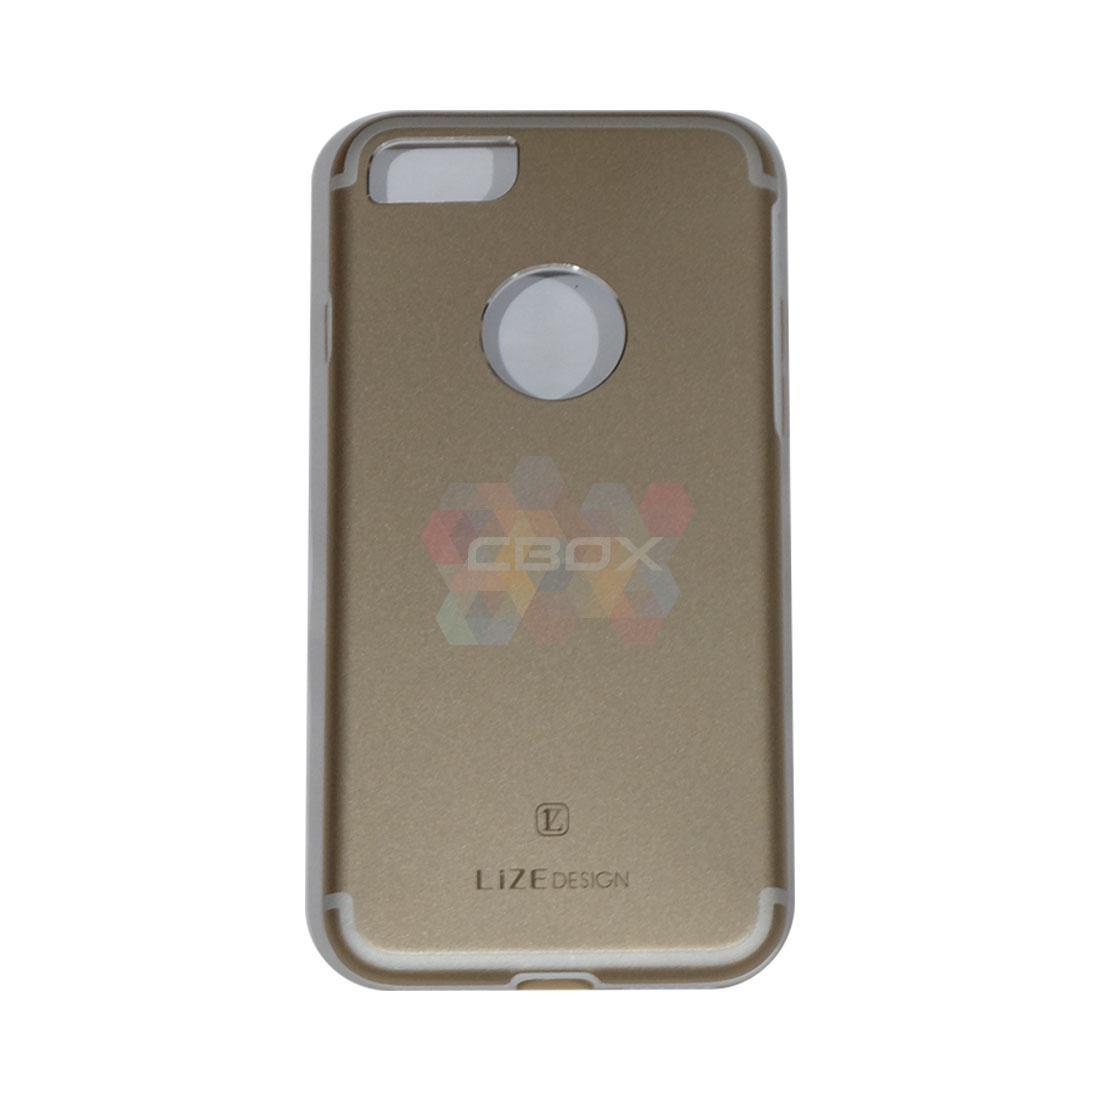 Lize Jaeger & Hardshell For Apple iPhone7 / iPhone 7 / iPhone 7G Ukuran 4.7 inch Hard Case / Hard Back Cover / casing HP Belakang - Gold